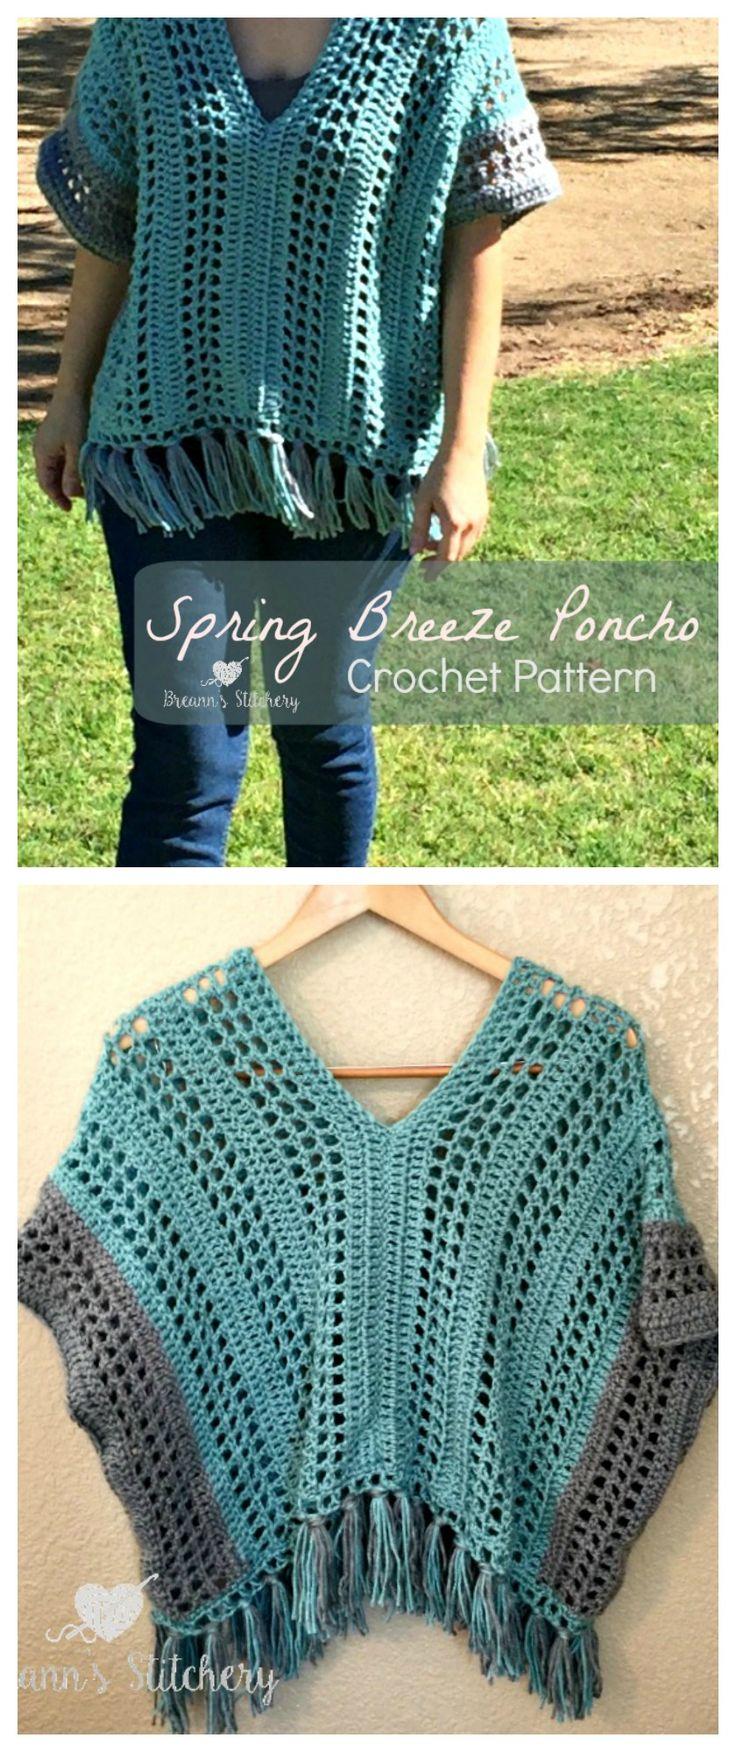 Spring Breeze Poncho By Breann - Free Crochet Pattern - (breannsstitchery)